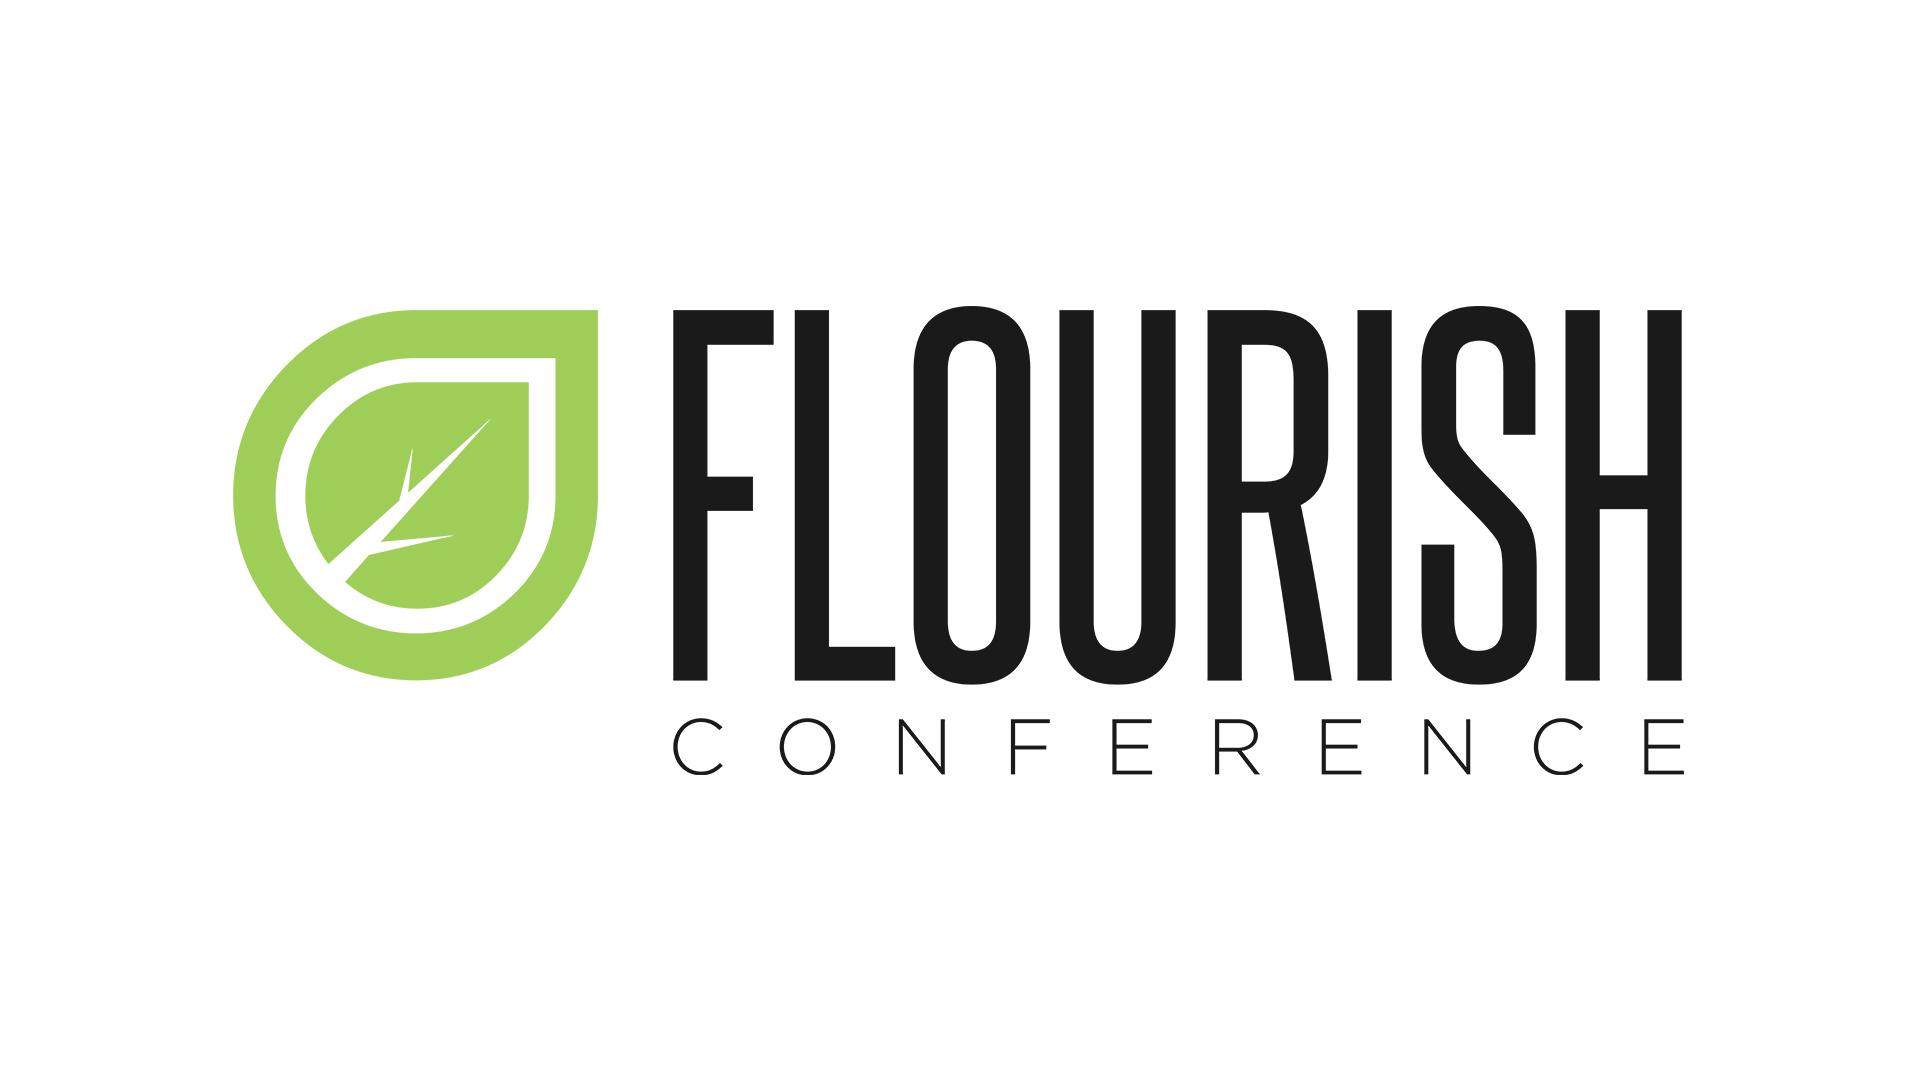 Flourish Conference 1920x1080.jpg